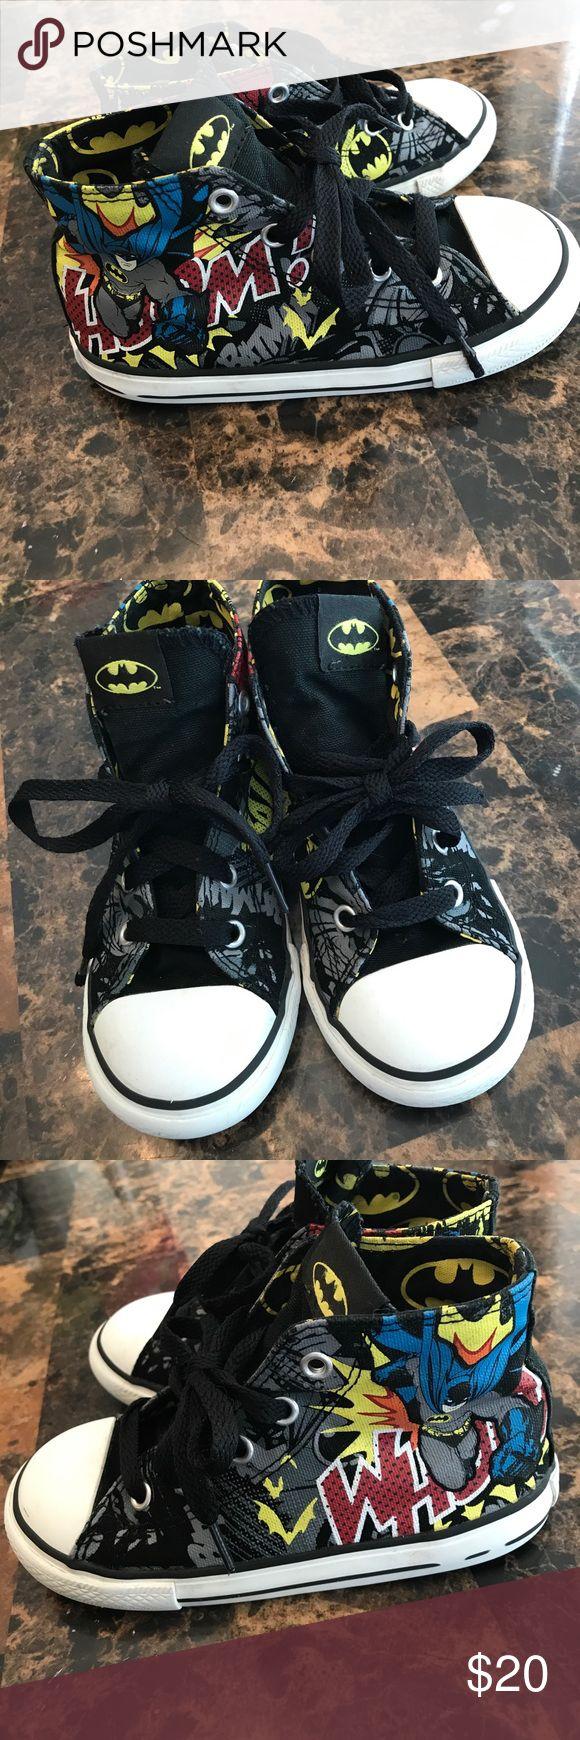 Batman Converse size 10 Batman Converse shoes. Size 10. Good used condition Converse Shoes Sneakers